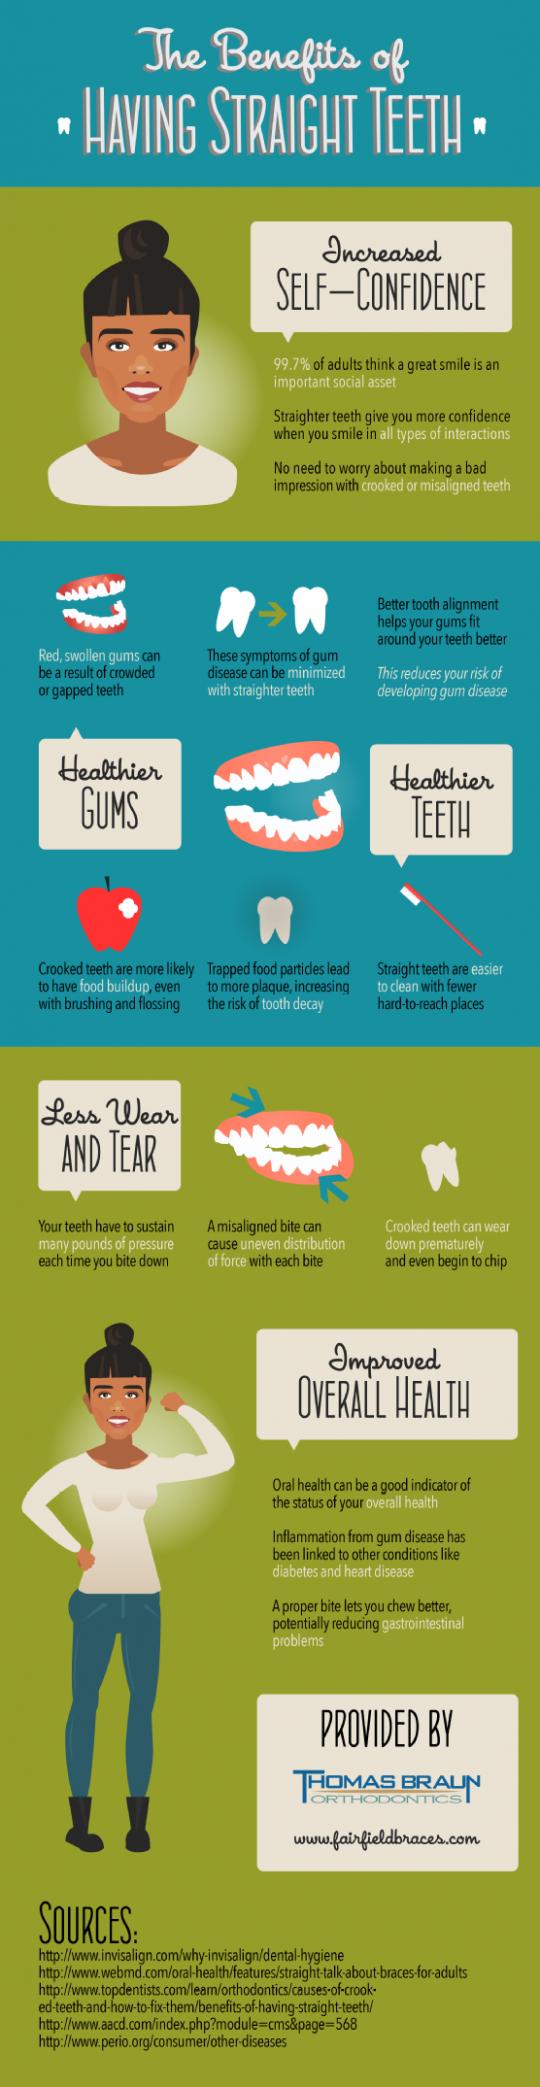 The Benefits of Having Straight Teeth